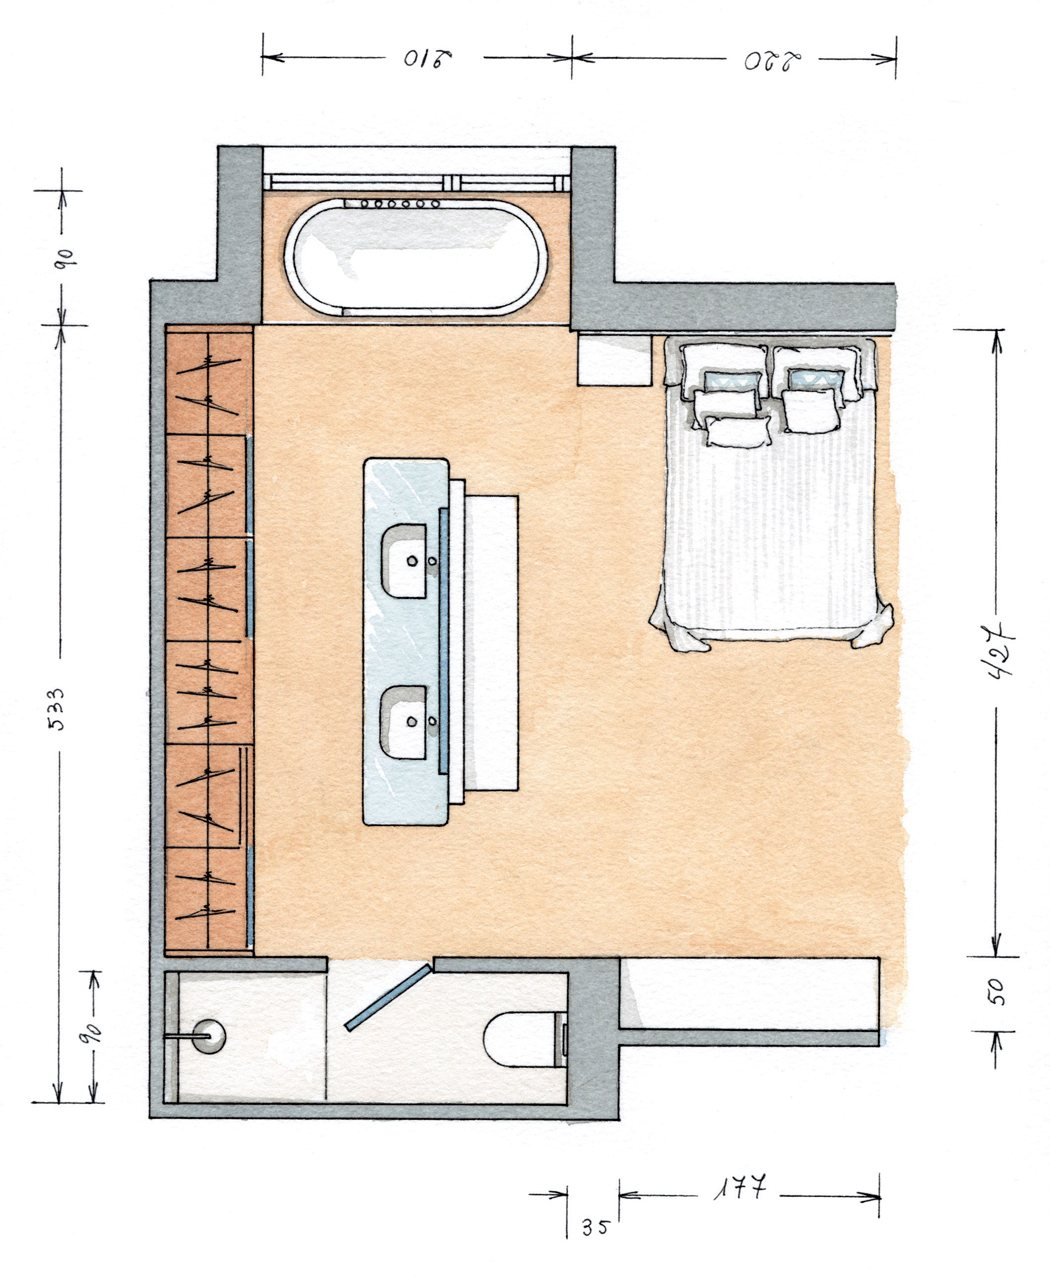 Un ba o reformado a medida for Planos de cocinas de 4x3